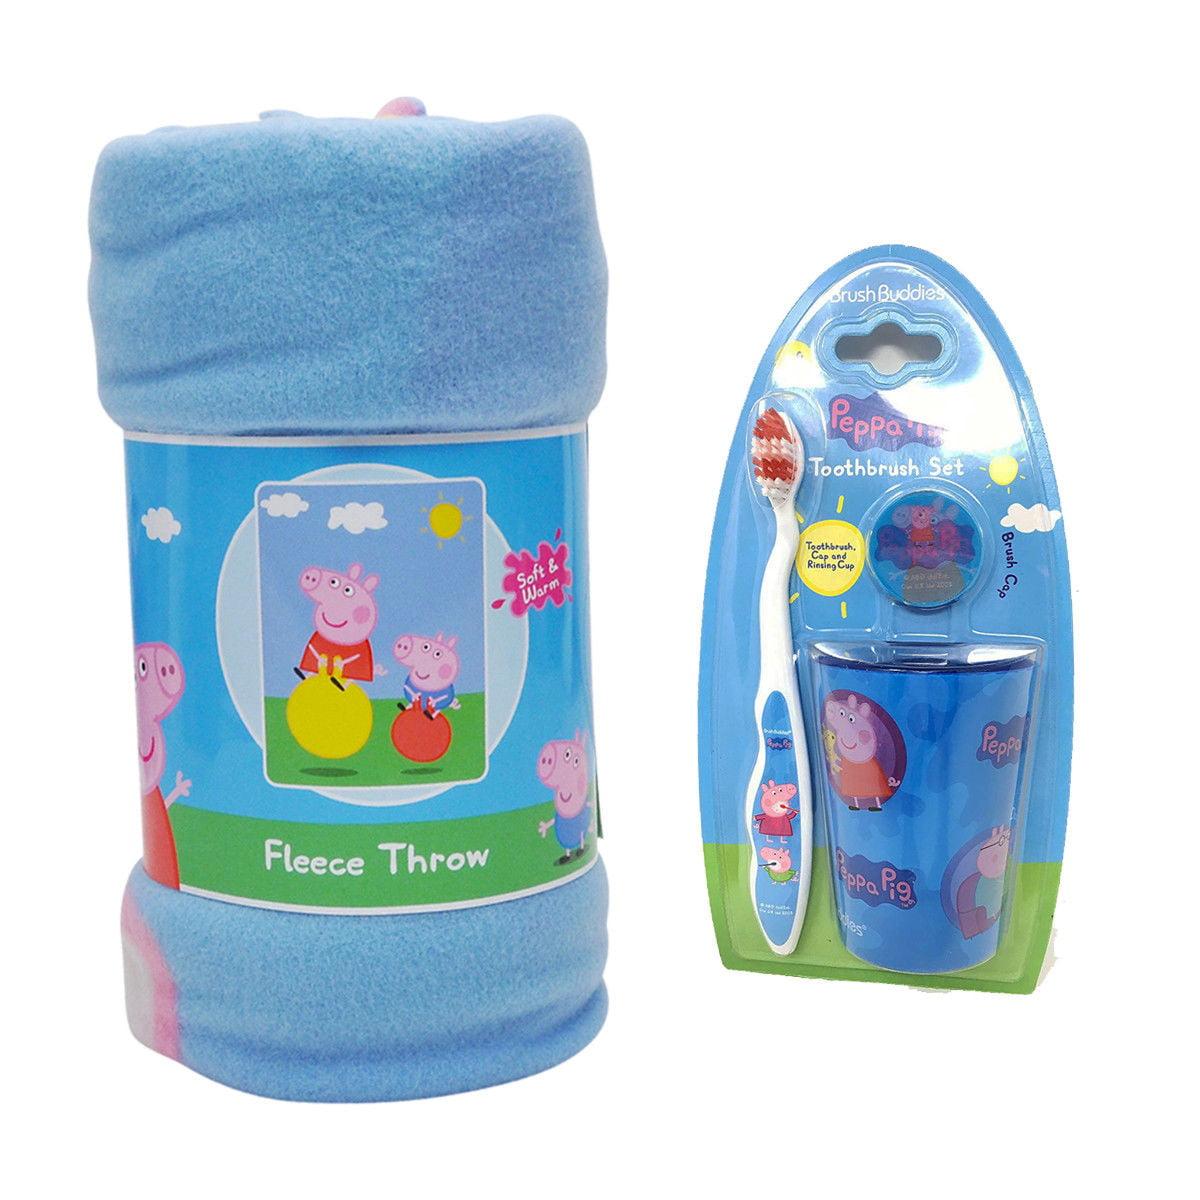 "Kids Peppa Pig Bounce Fleece Throw Blanket 45""x60"" & Toothbrush Set"